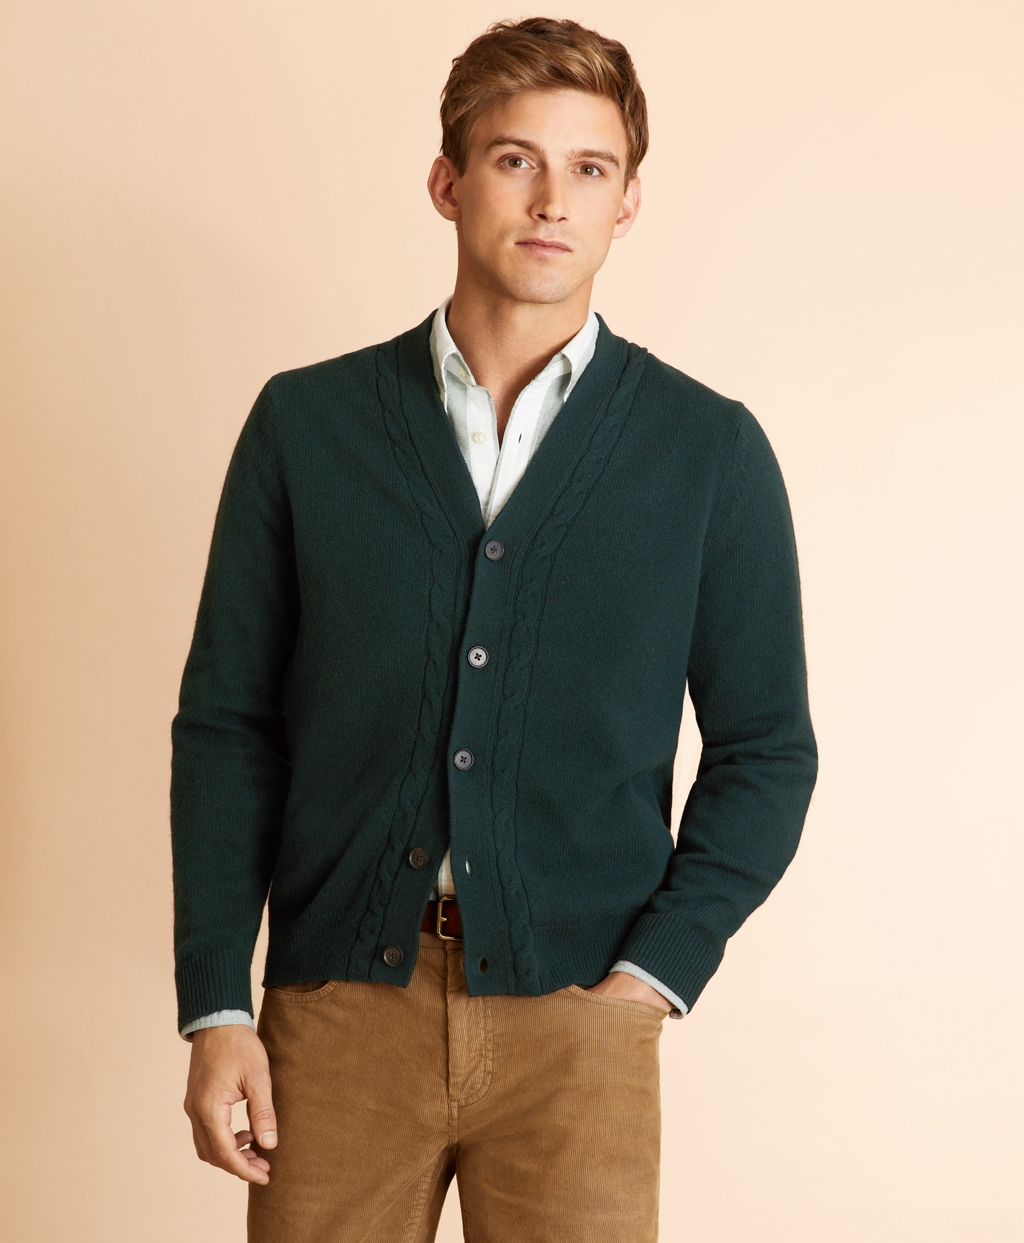 Men's Vintage Sweaters, Retro Jumpers 1920s to 1980s Brooks Brothers Mens Alpaca-Blend Cable V-Neck Cardigan $69.00 AT vintagedancer.com